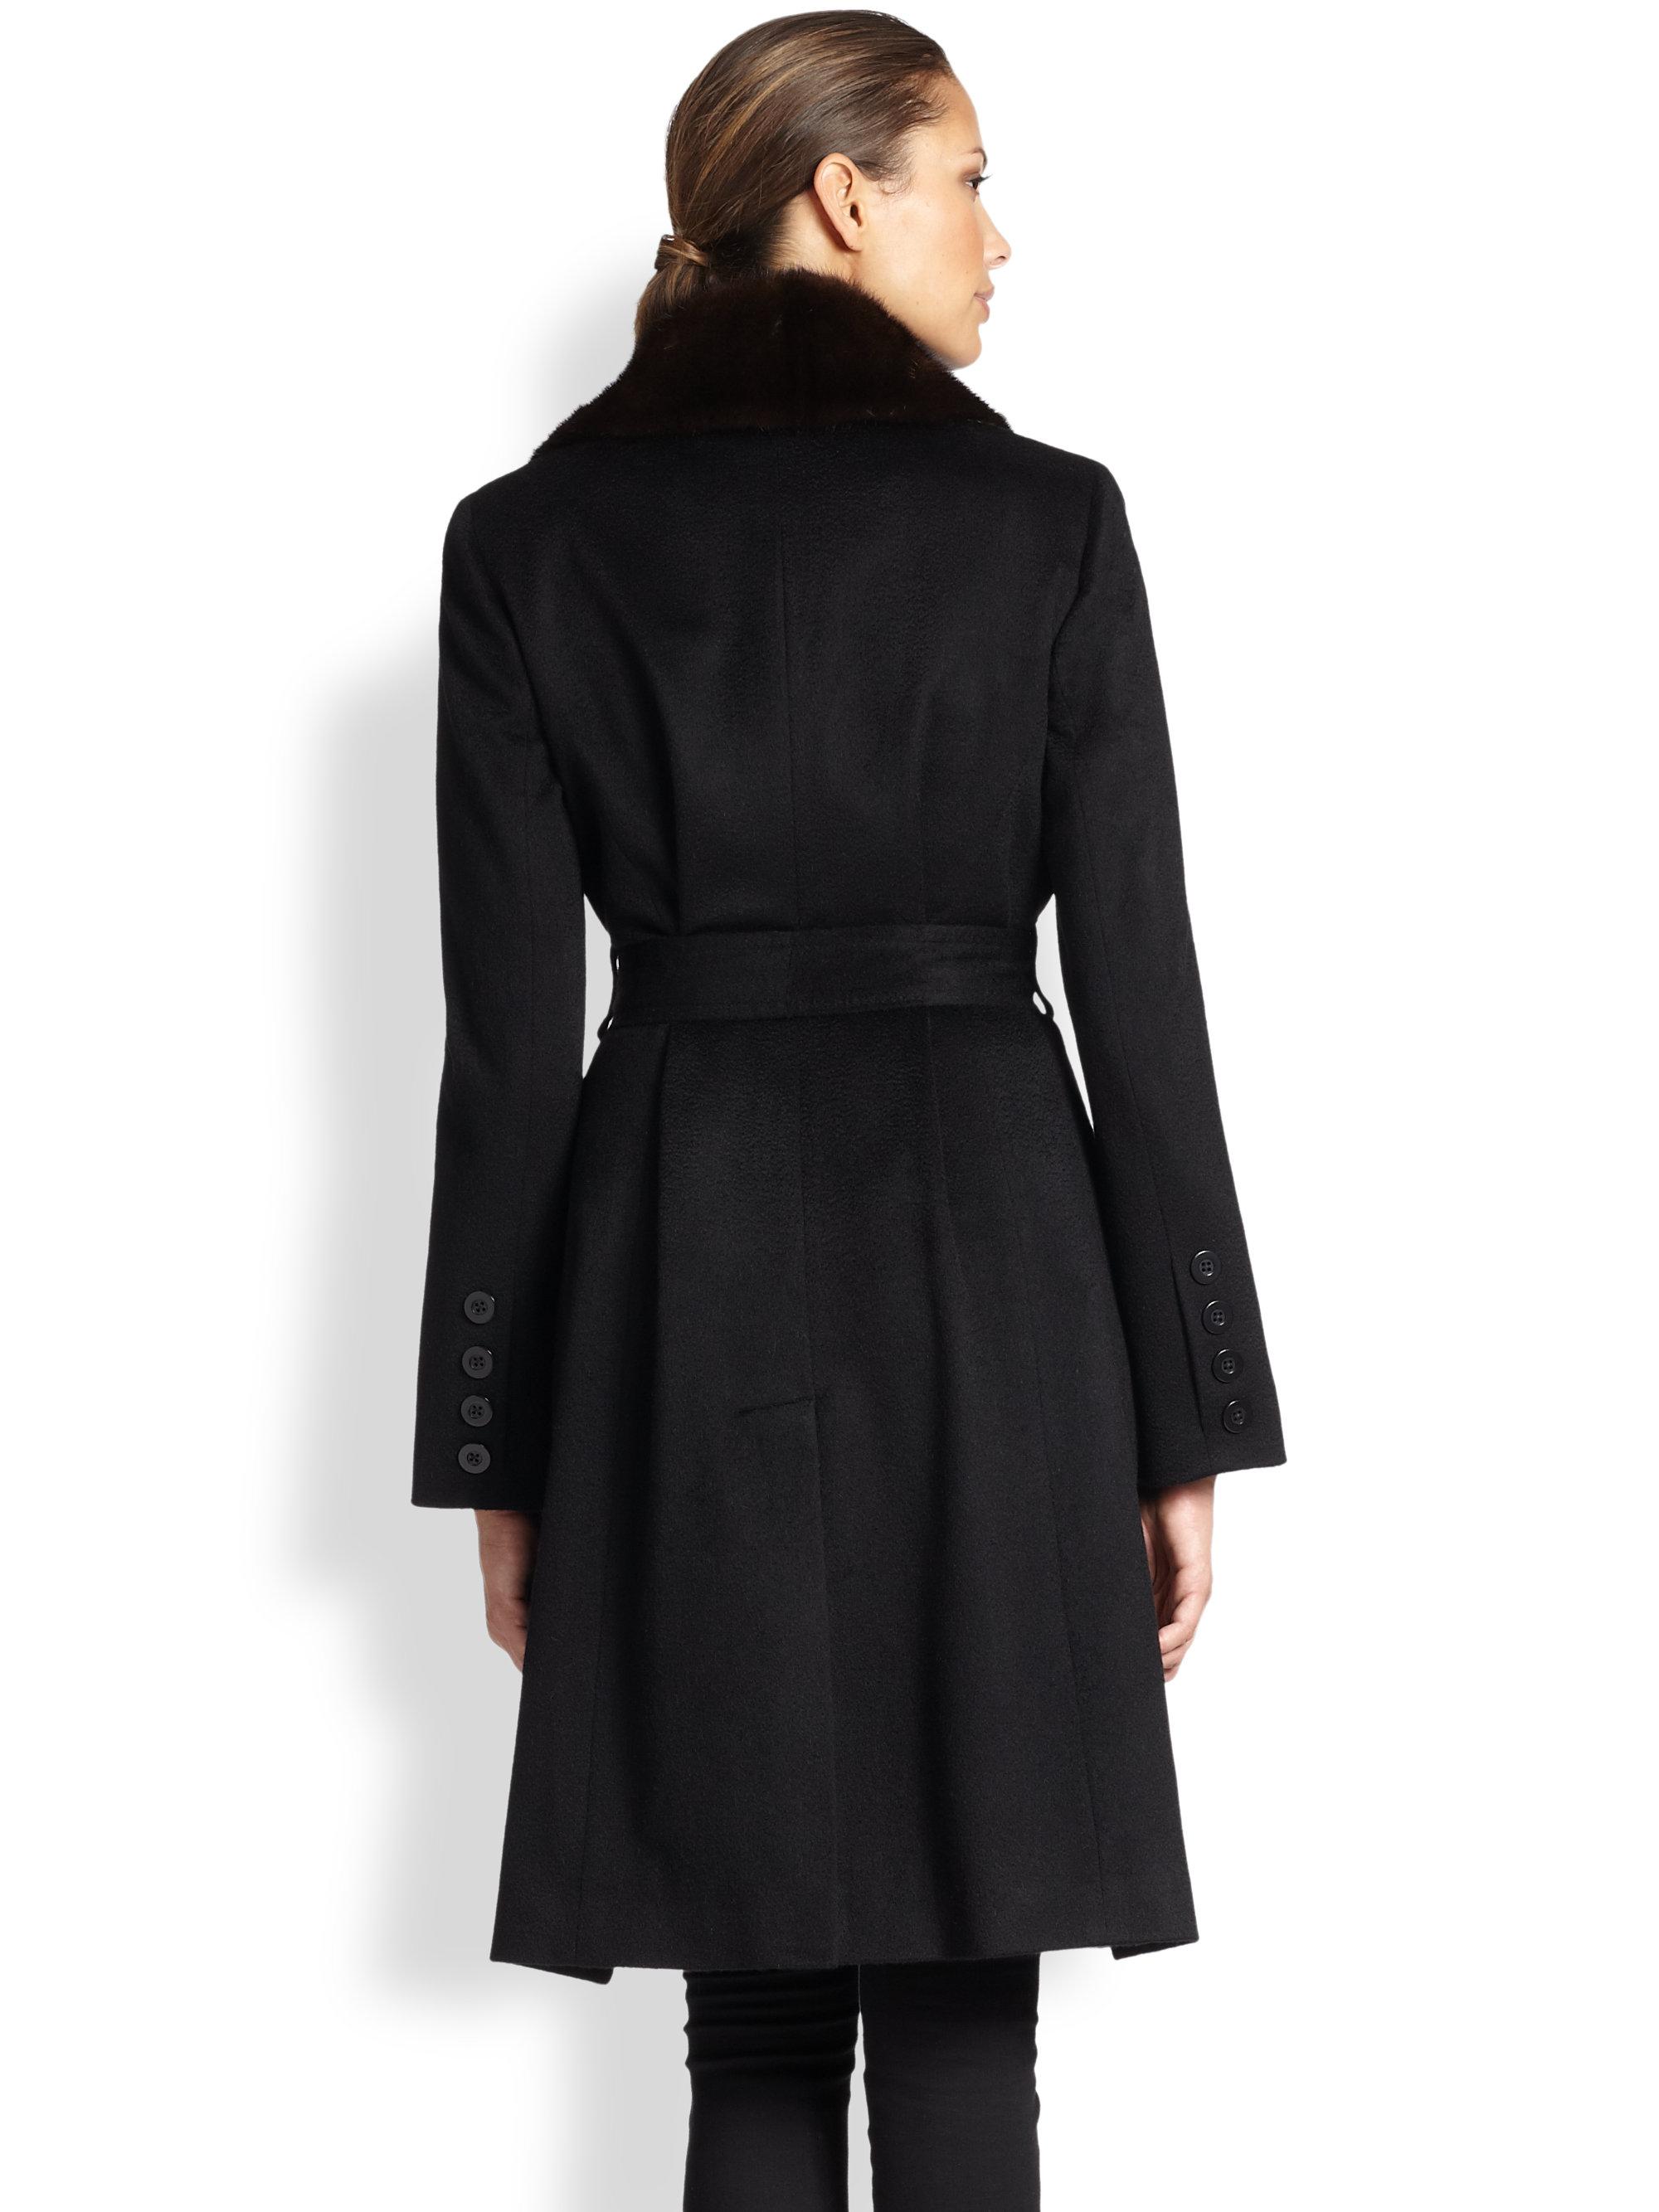 Sofia cashmere Mink-Collar Cashmere Wrap Coat in Black | Lyst